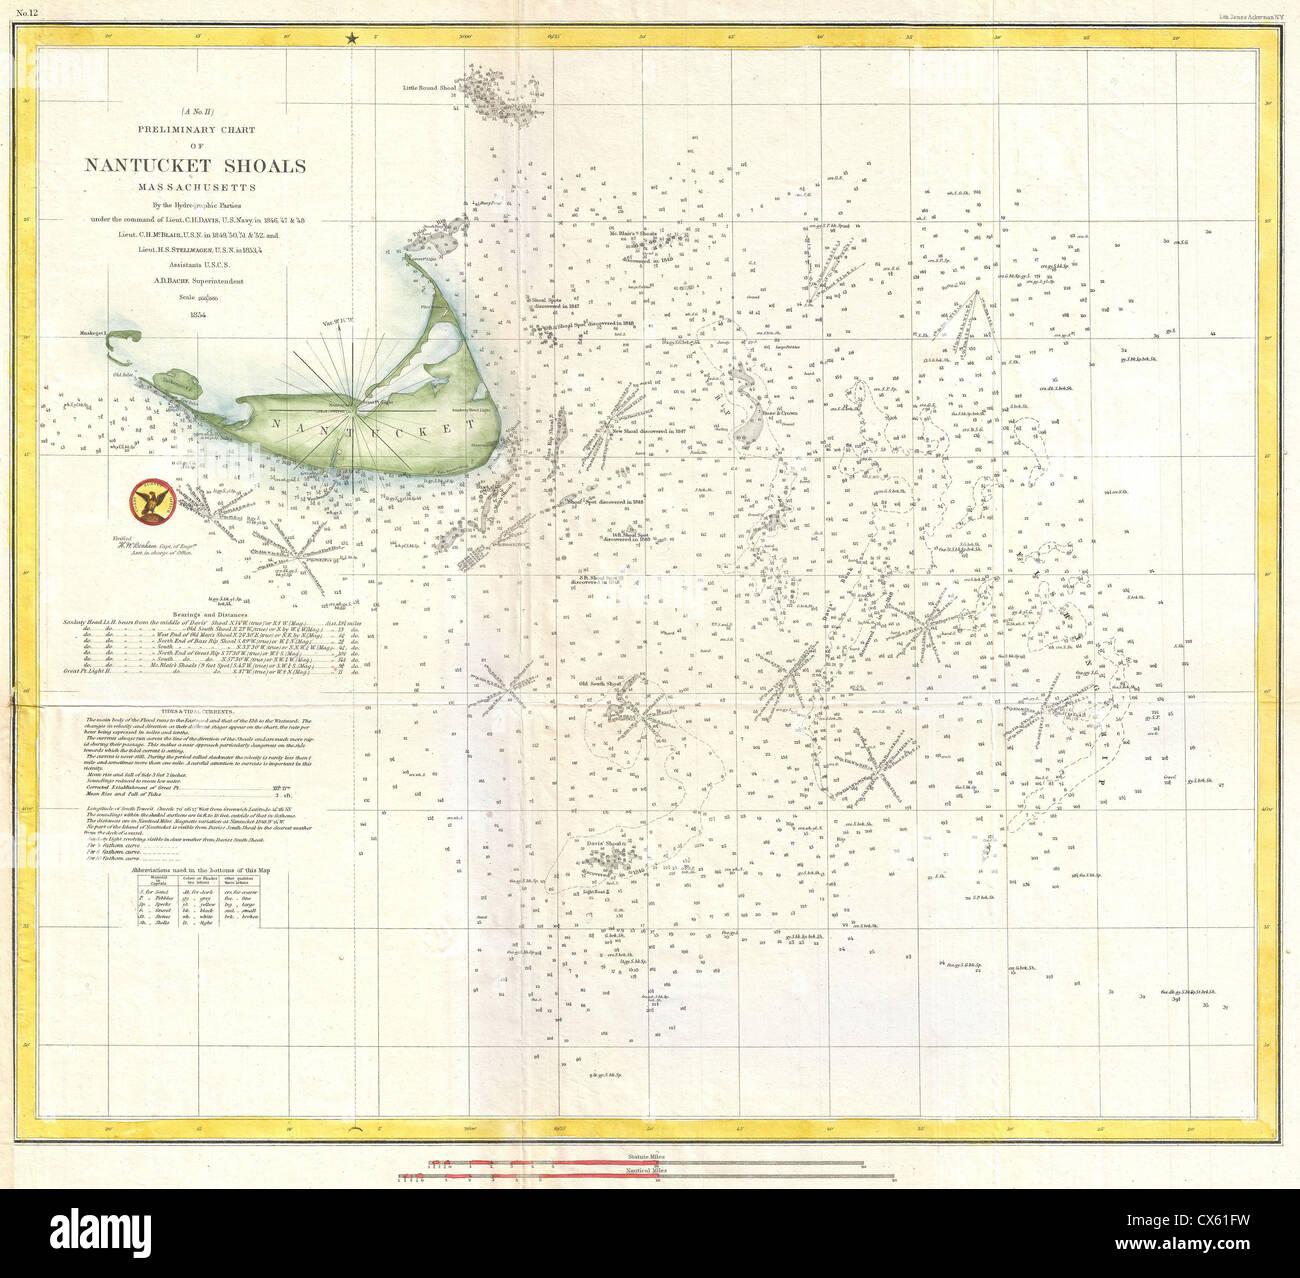 1854 Us Coast Survey Nautical Chart Or Map Of Nantucket Stock - 1854-us-map